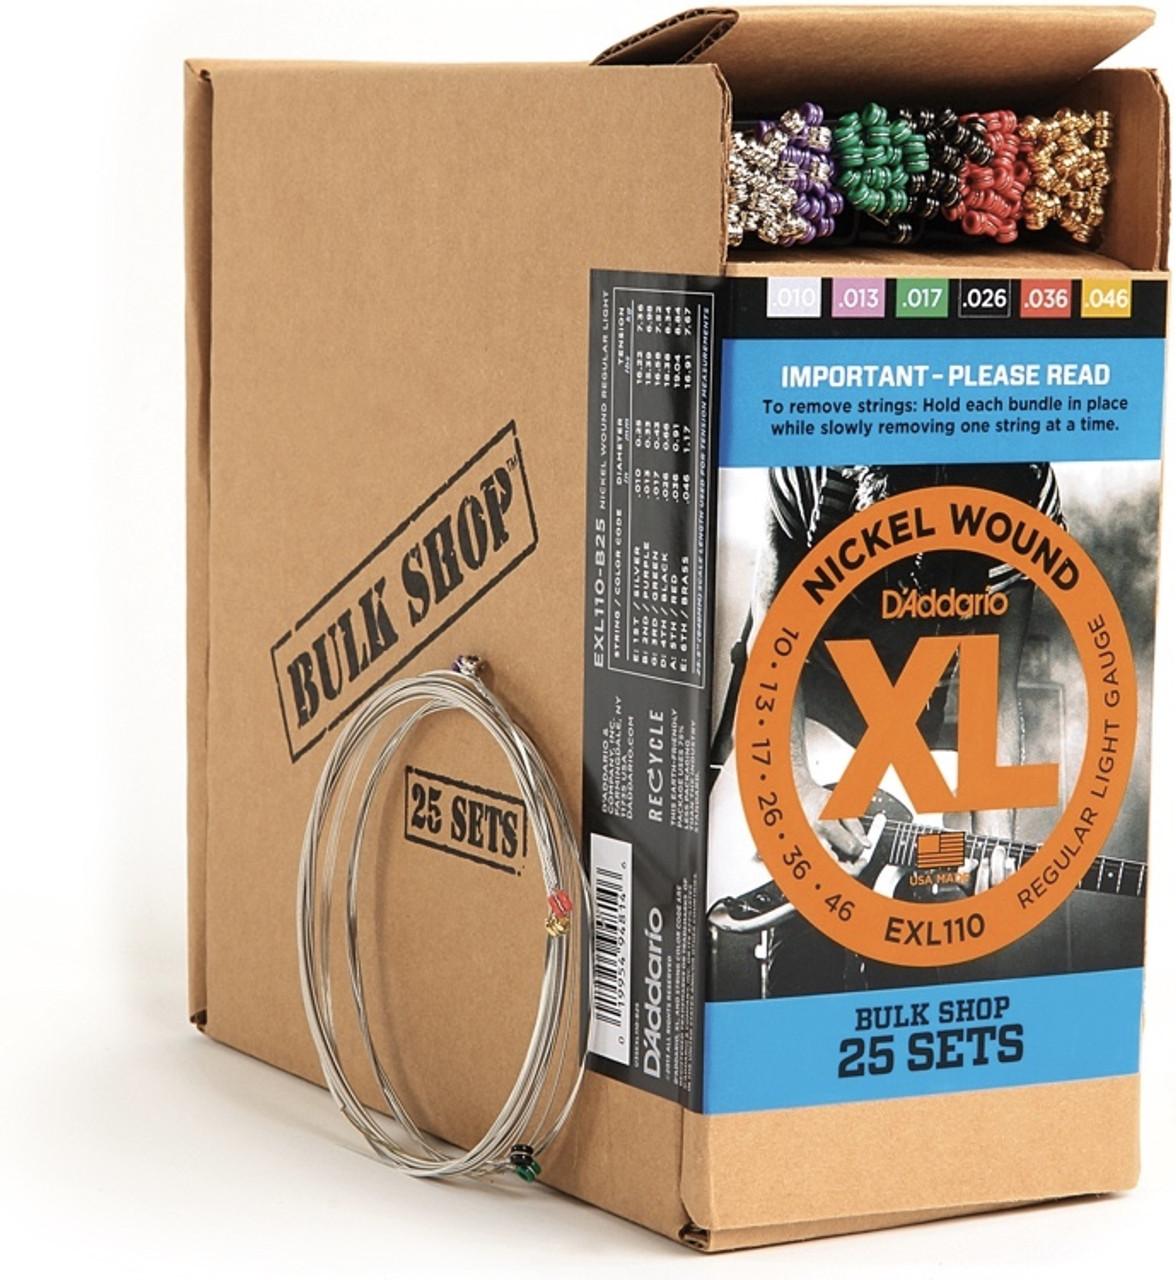 D'addario XL Bulk Shop 25 Sets Ireland